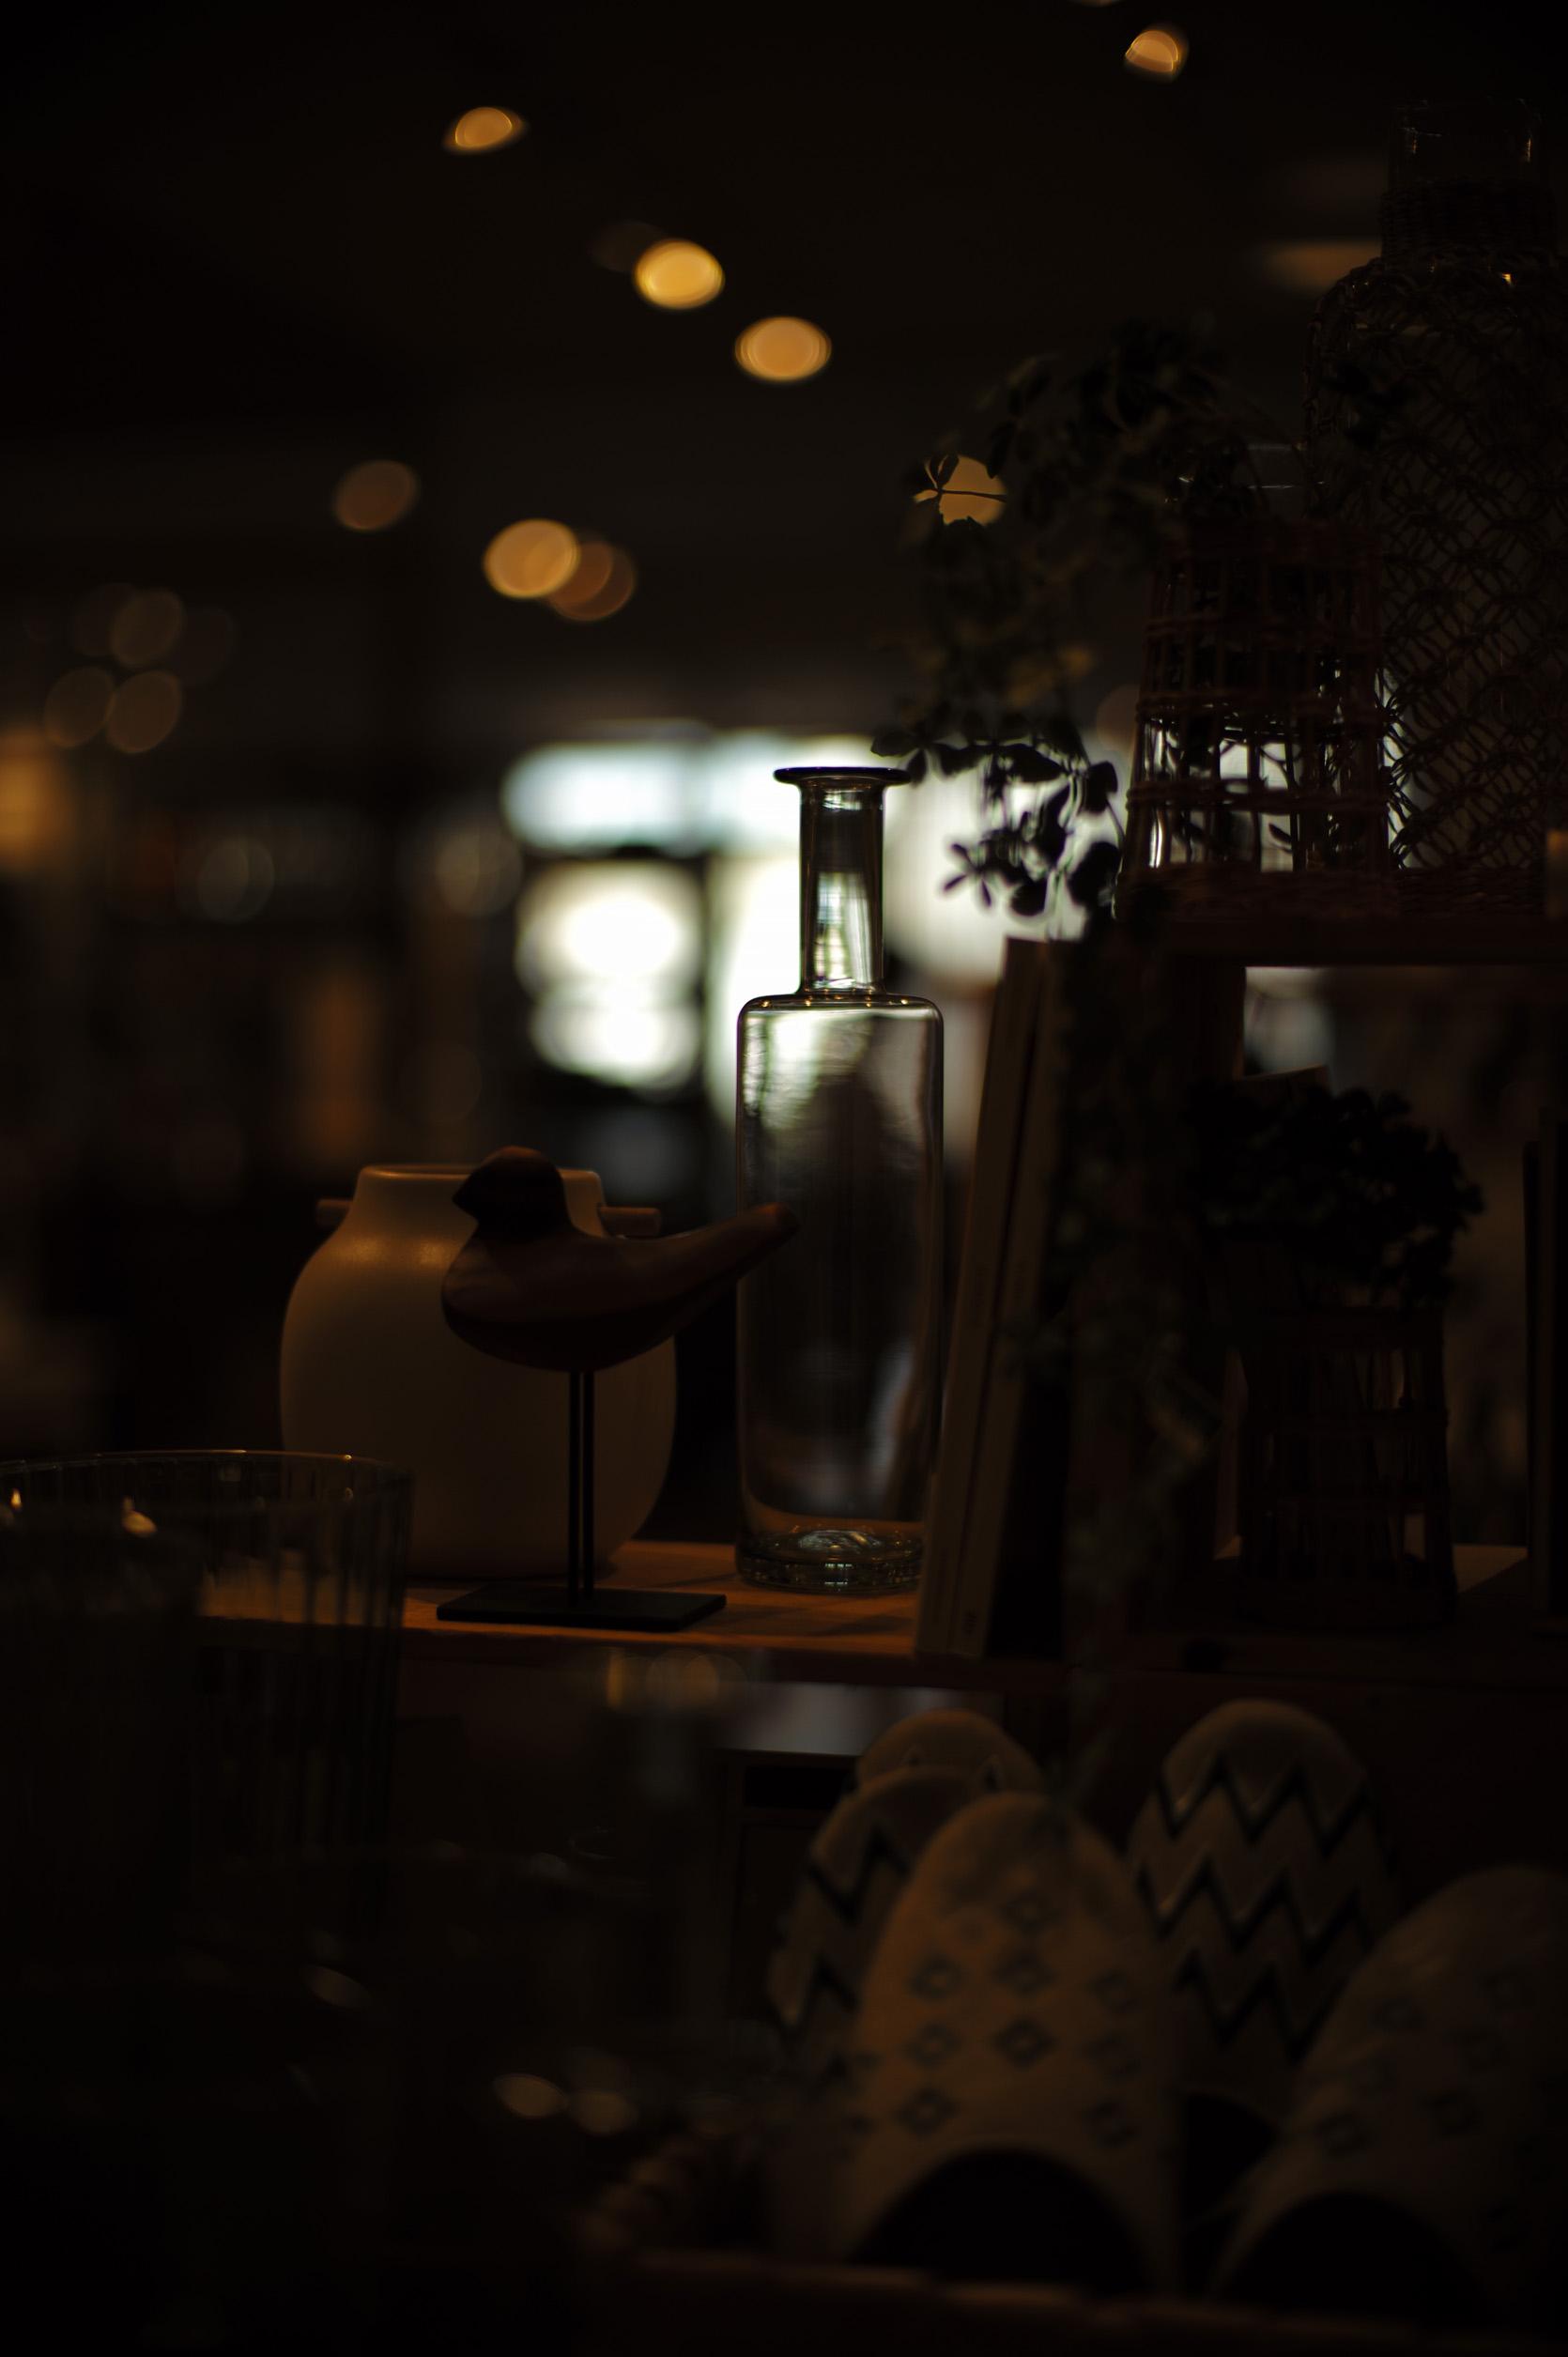 014221_09_leica_summicron_35mm_f2_m_black_paint